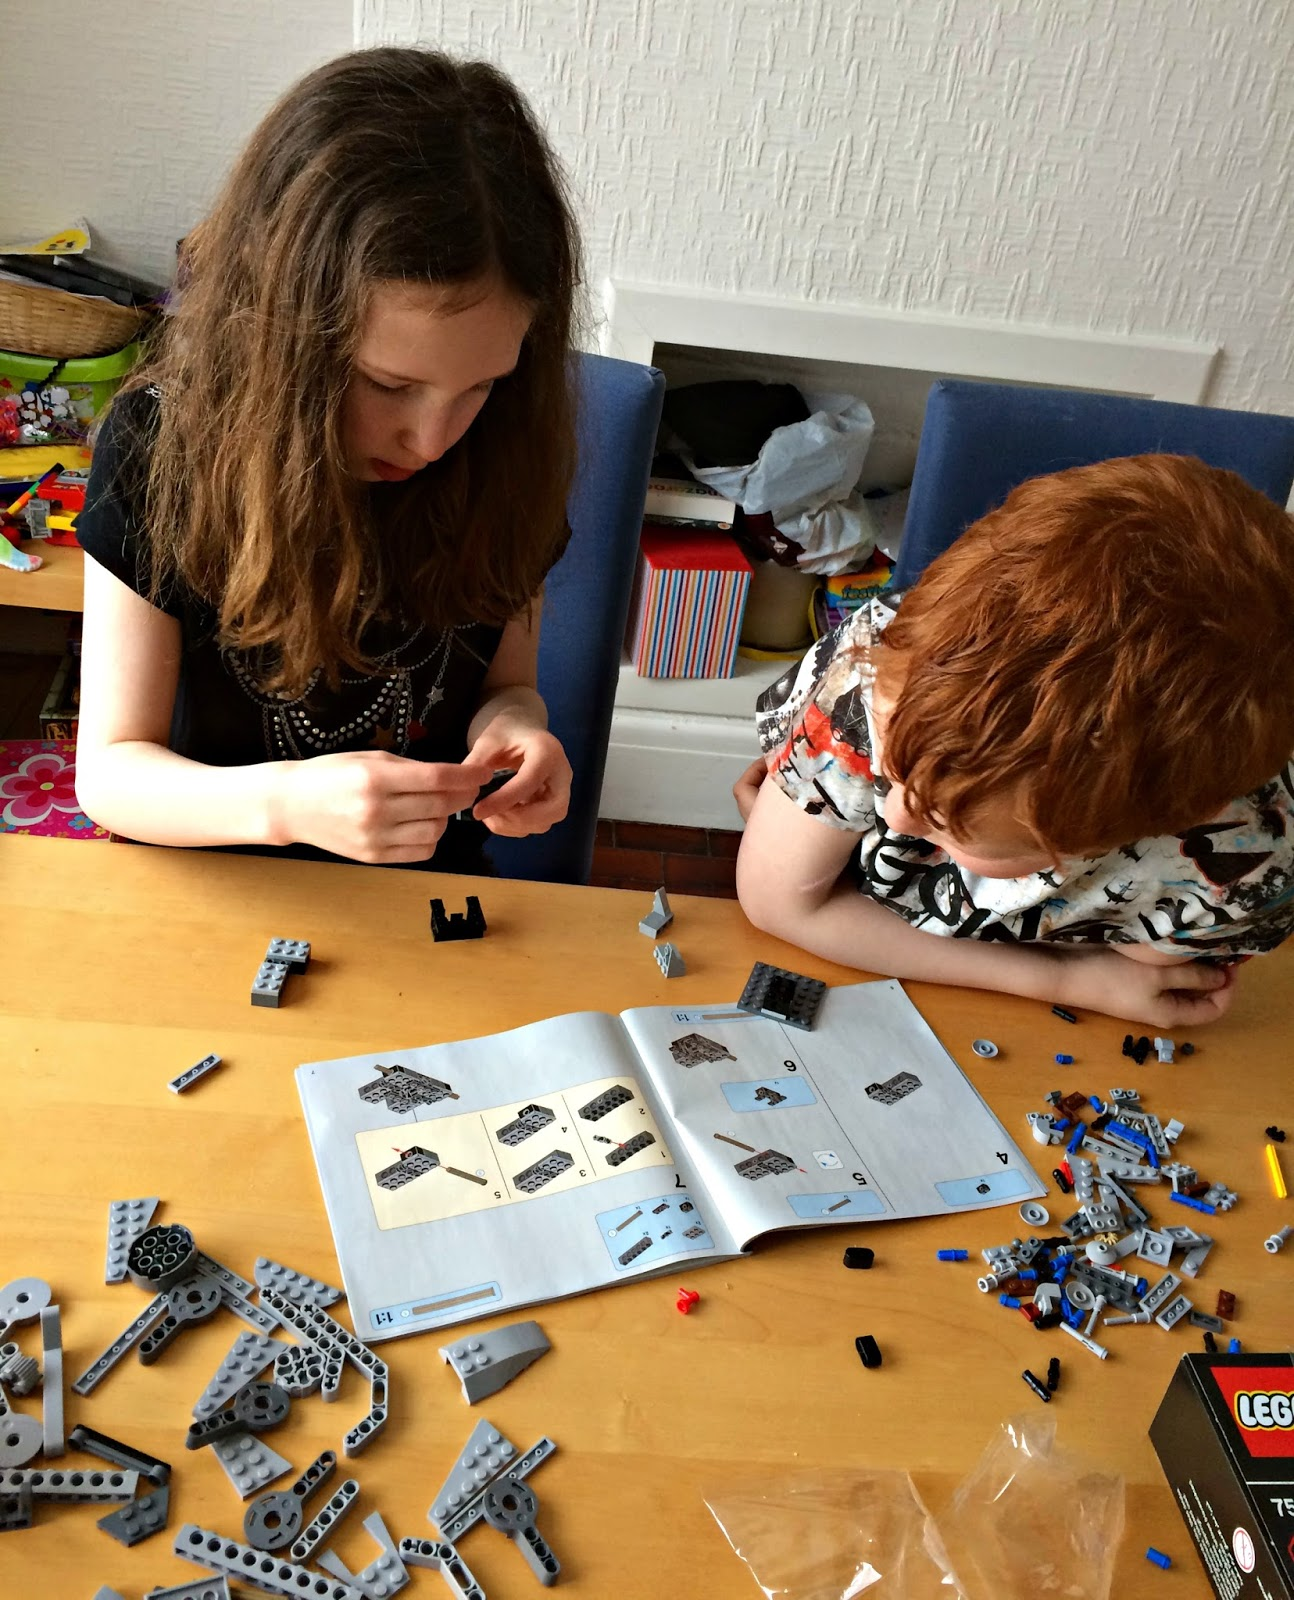 Caitlin & Ieuan building Lego